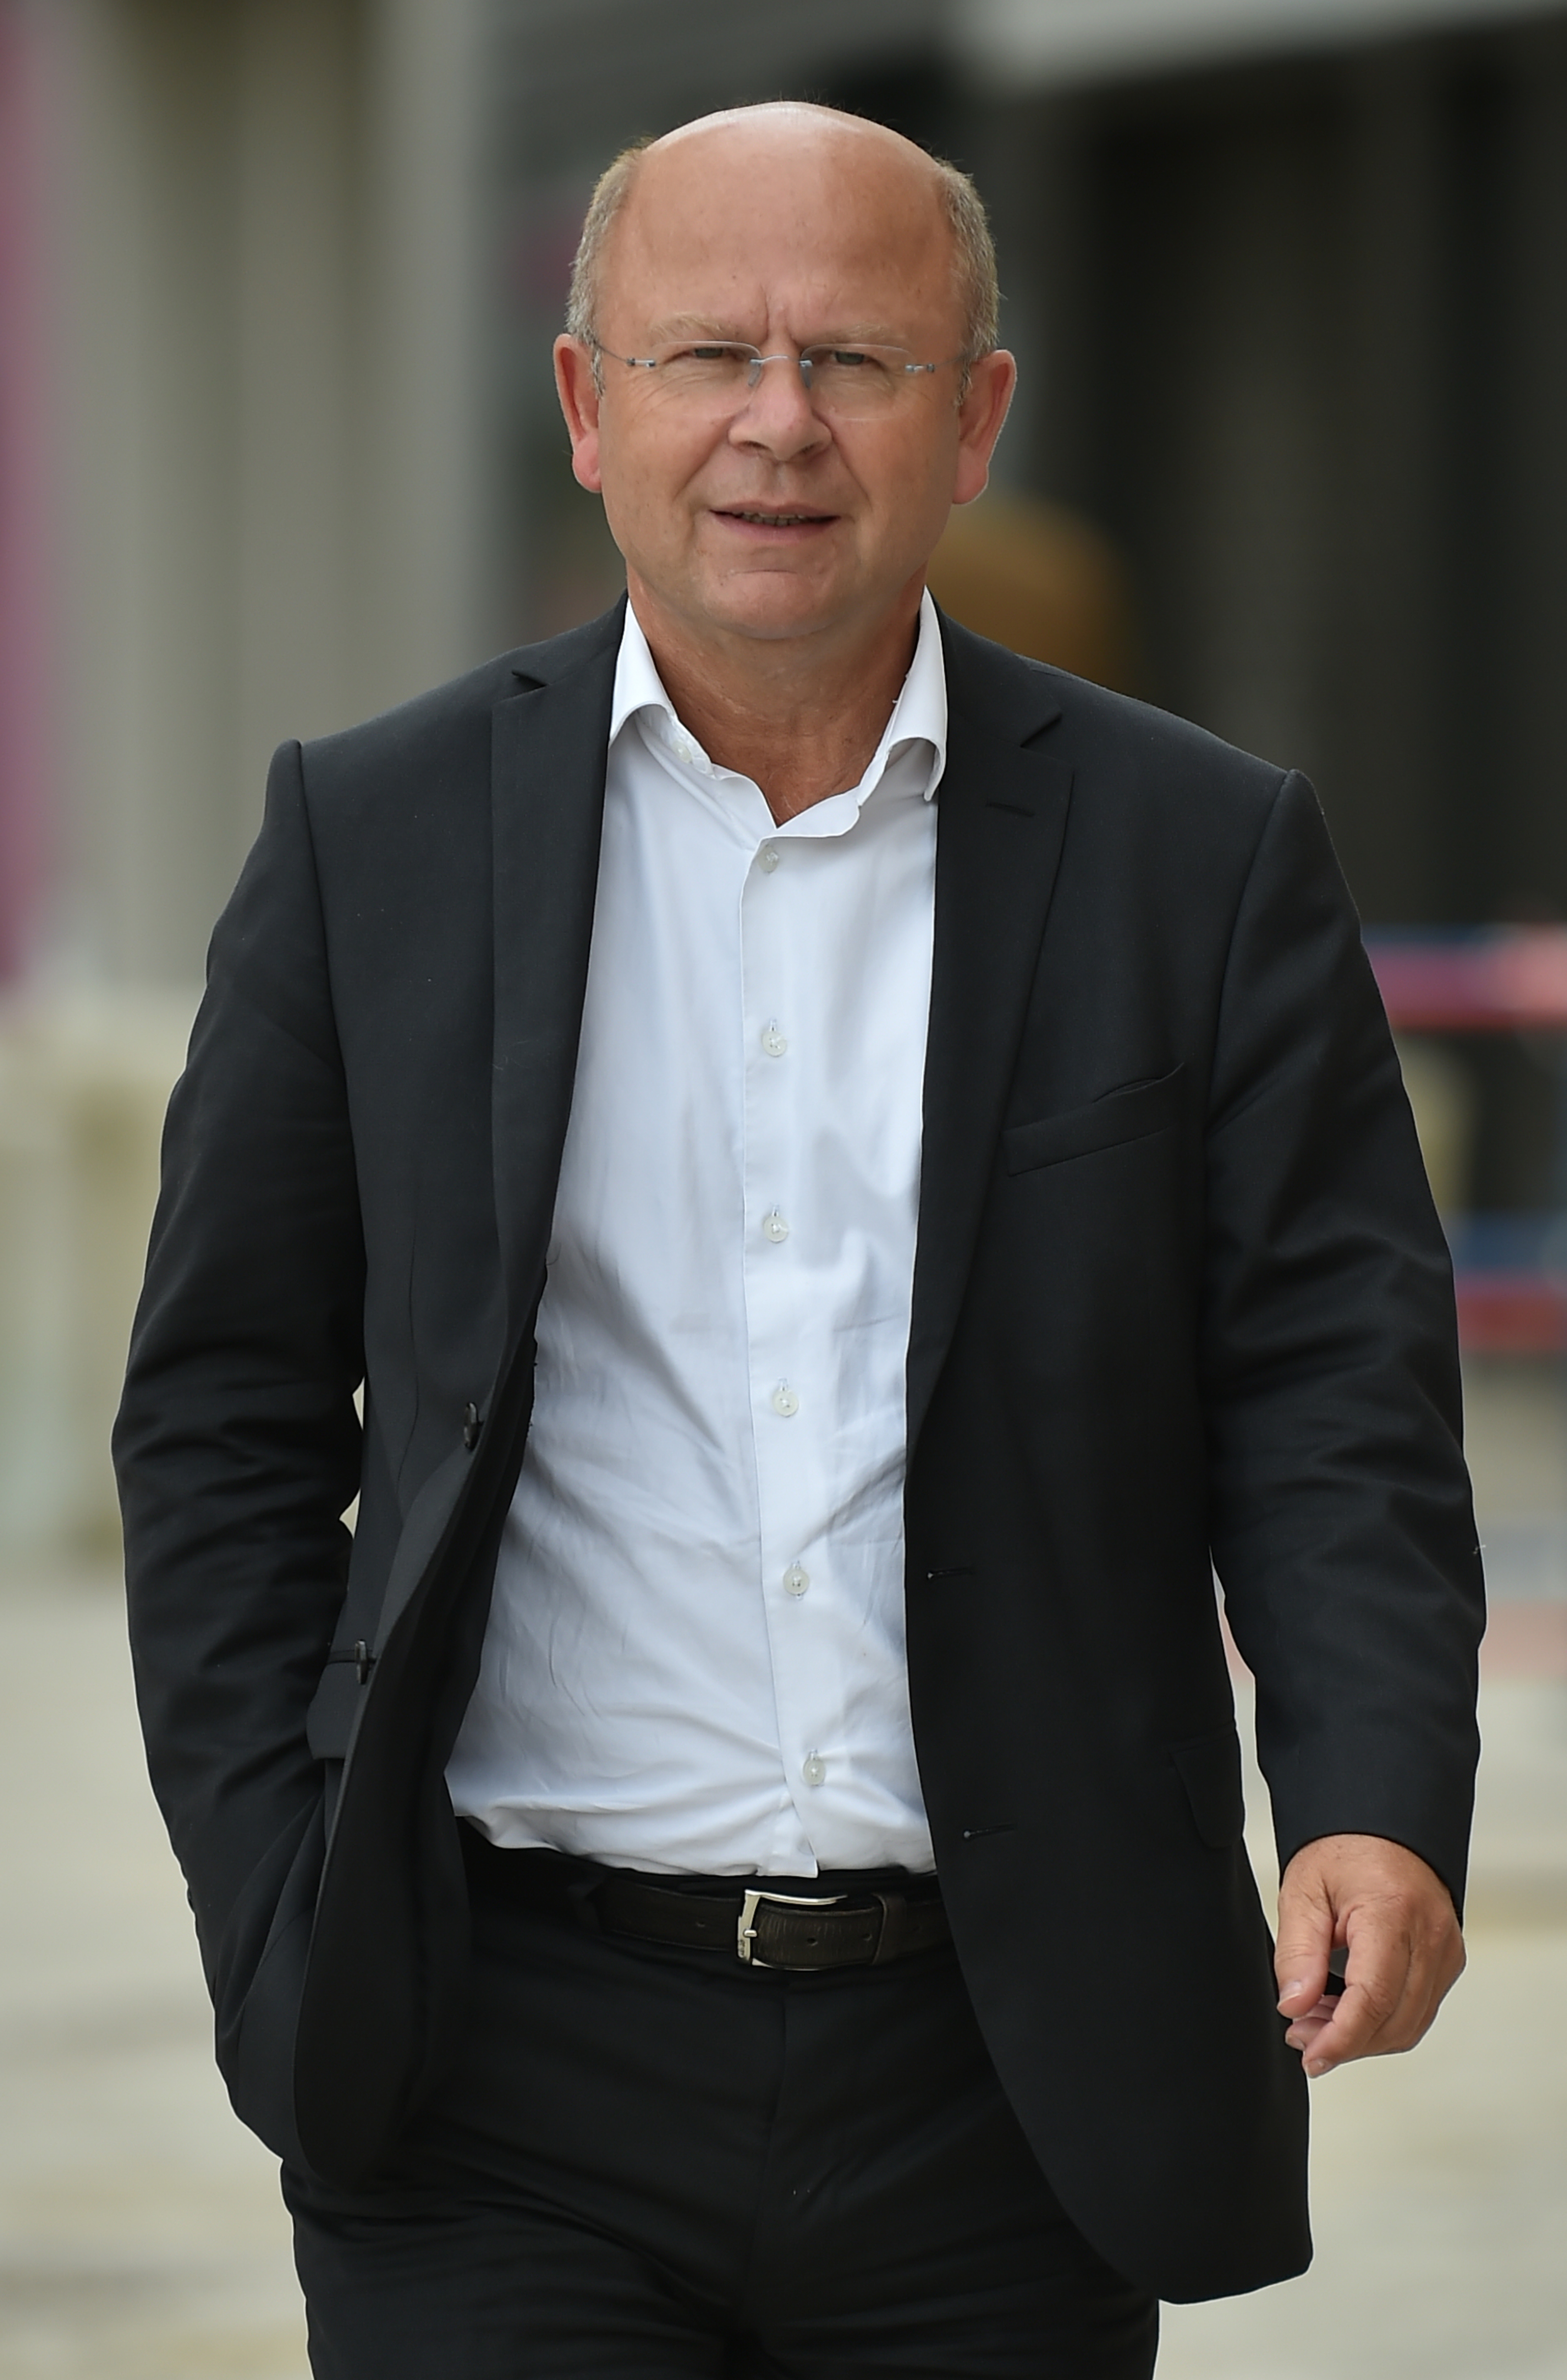 Jean-Pierre Gorges